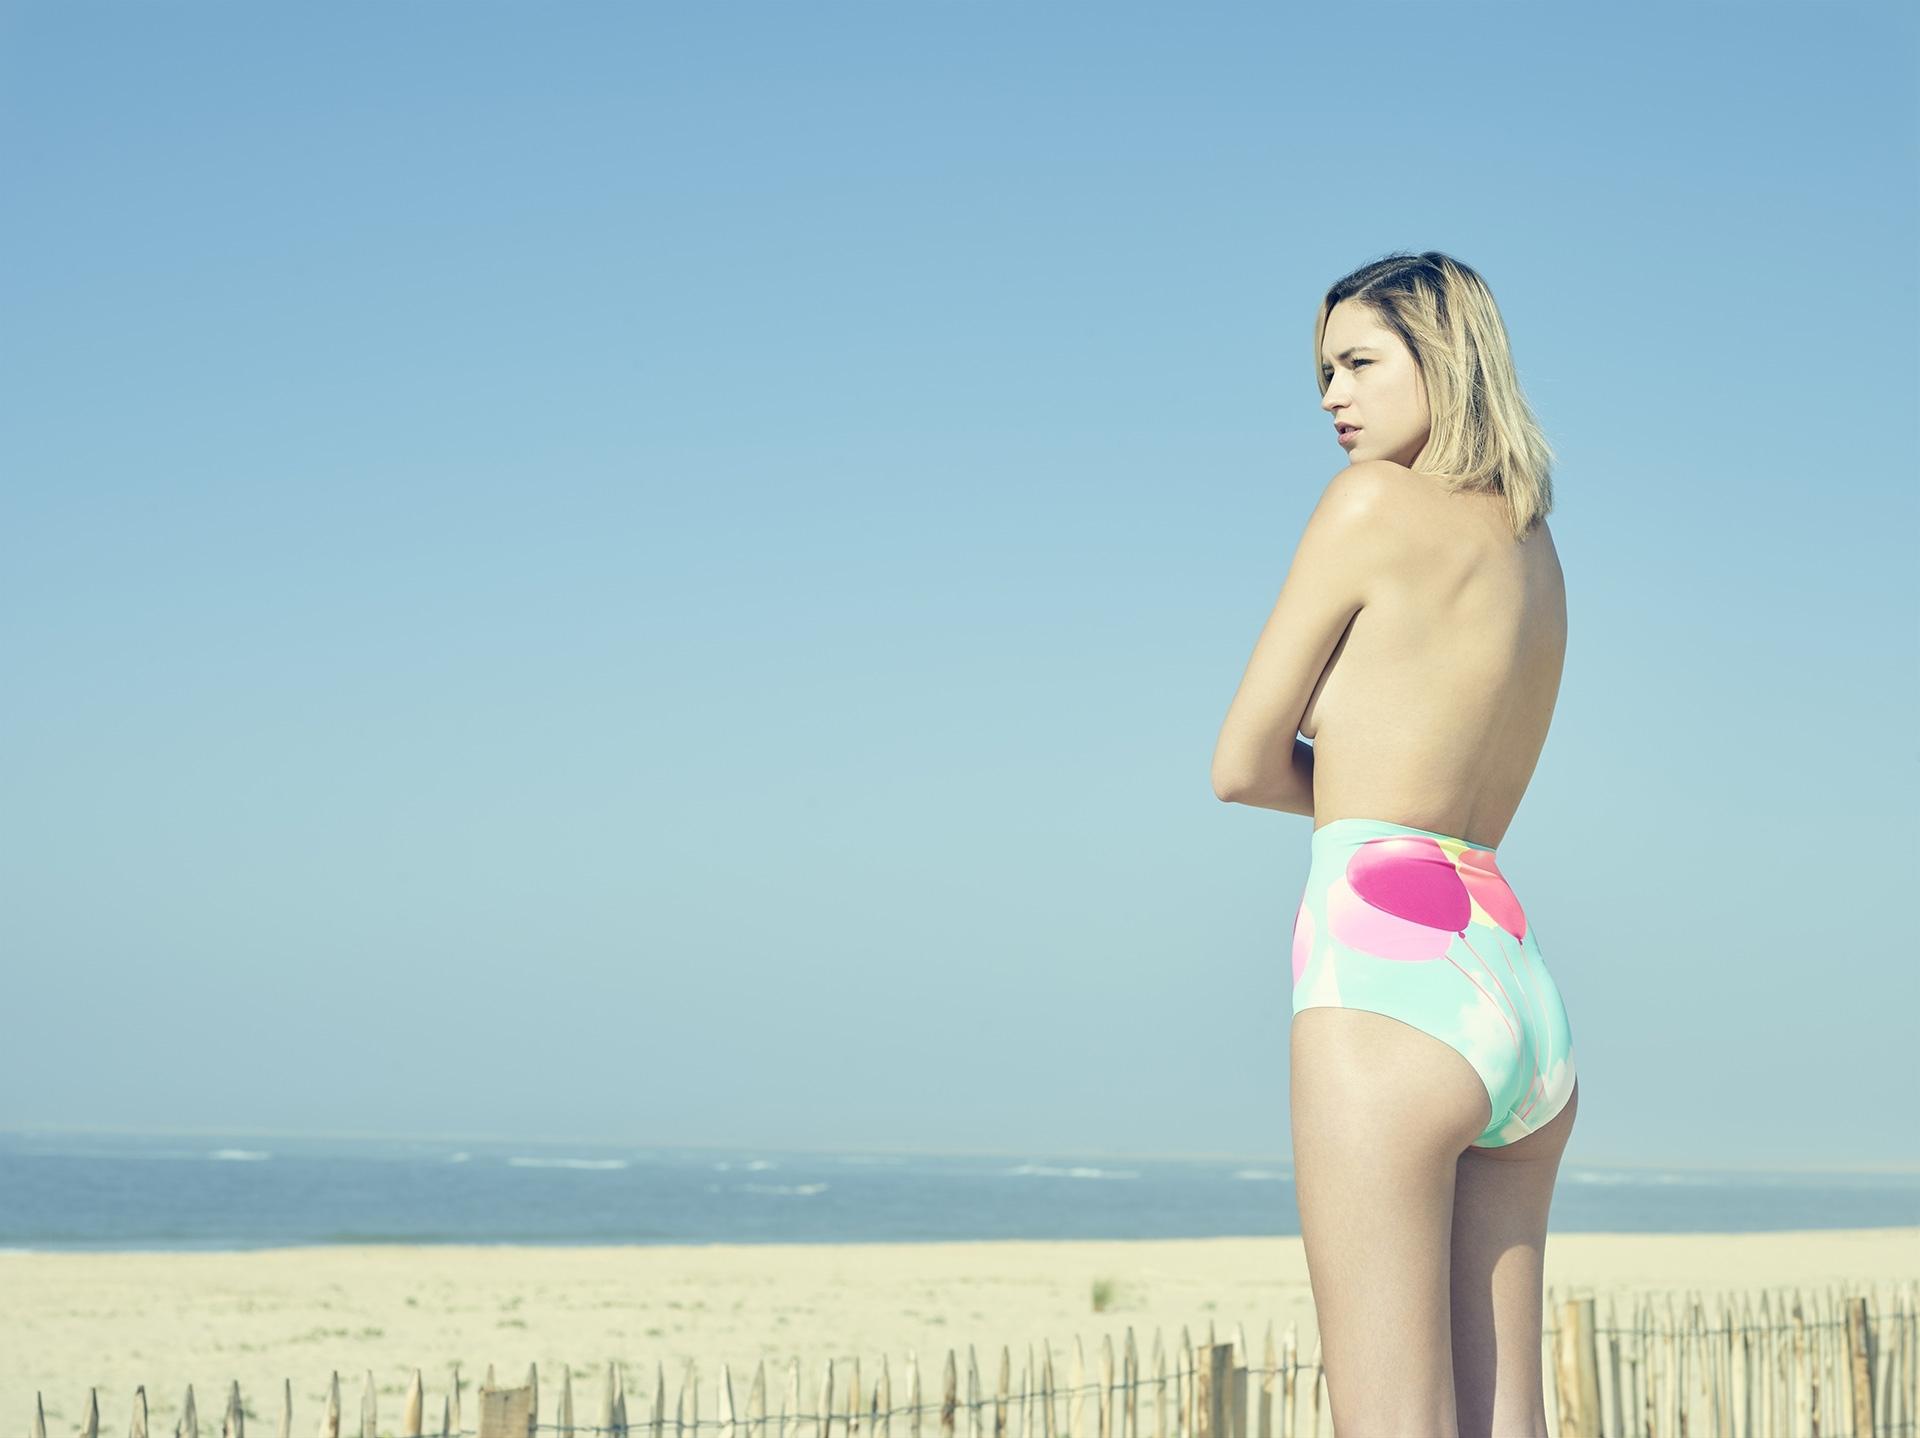 beach desert blue sky swimwear frederic mercier photographer edito lifestyle us american dream fashion one color